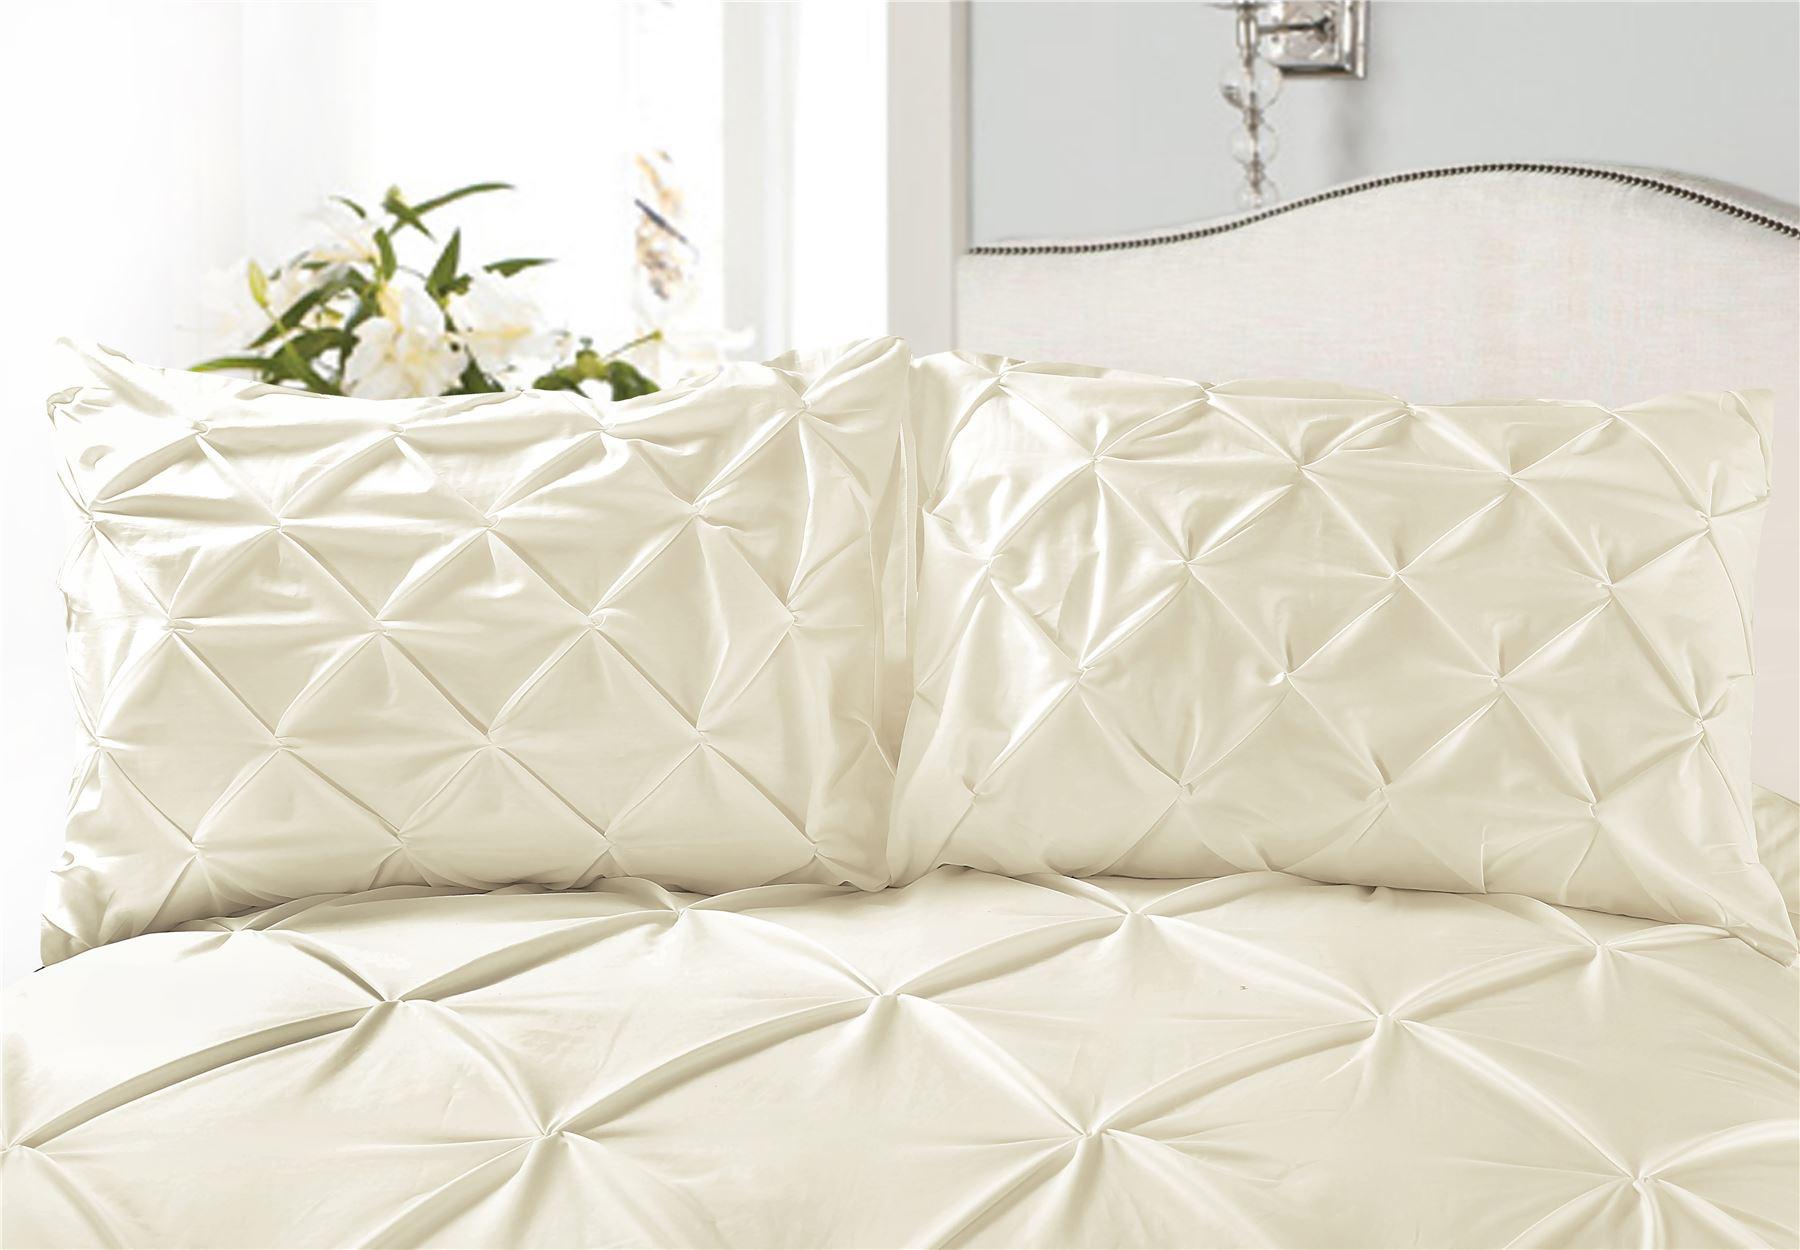 Luxury-Pure-100-Cotton-200-Thread-Pinch-Pleat-Pintuck-Puckering-Duvet-Cover-Set thumbnail 9